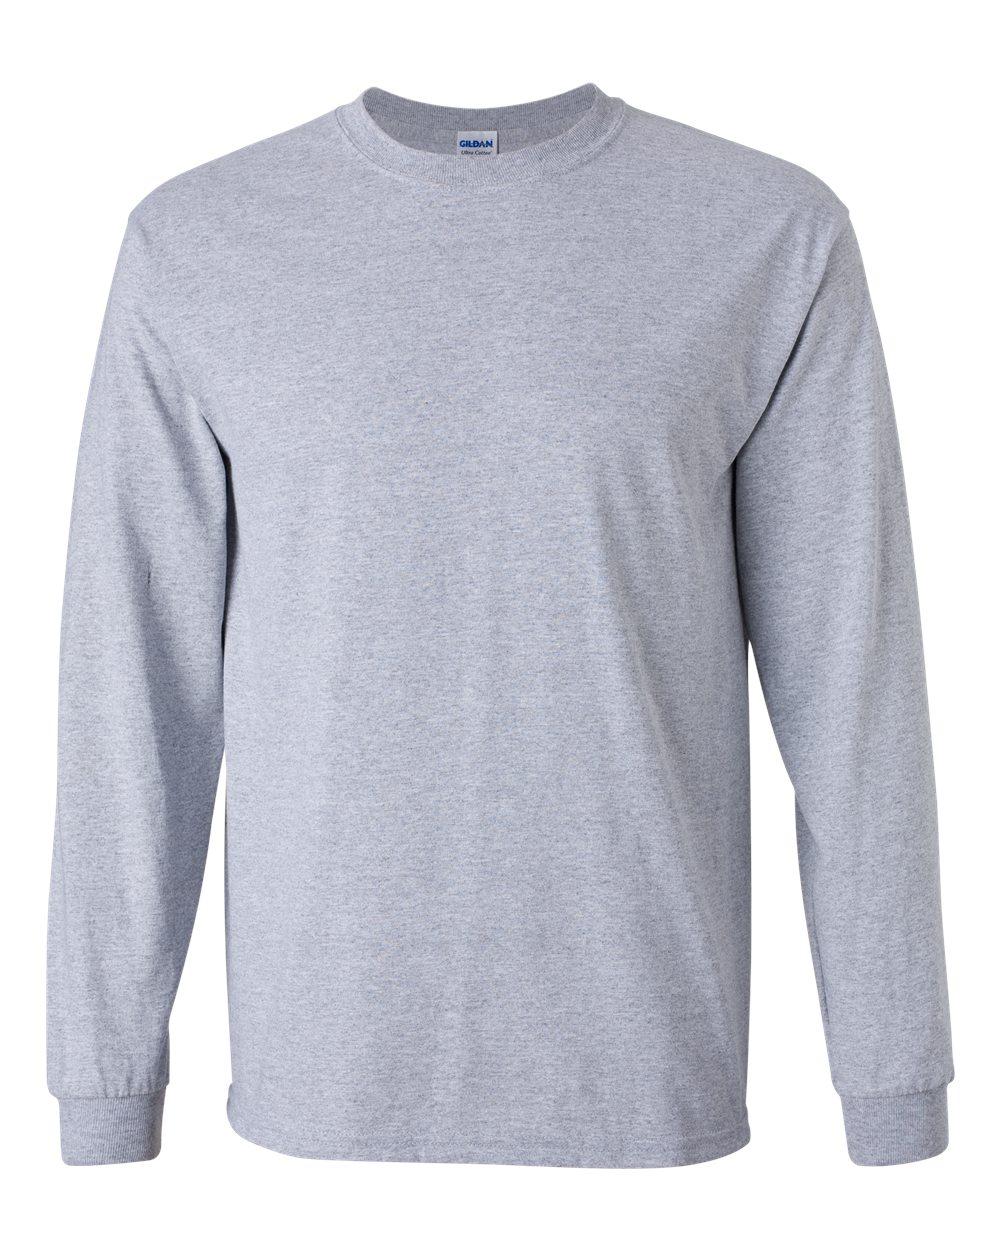 Gildan Ultra Cotton Mens Crewneck Long Sleeve T Shirt 2400 Sport ...